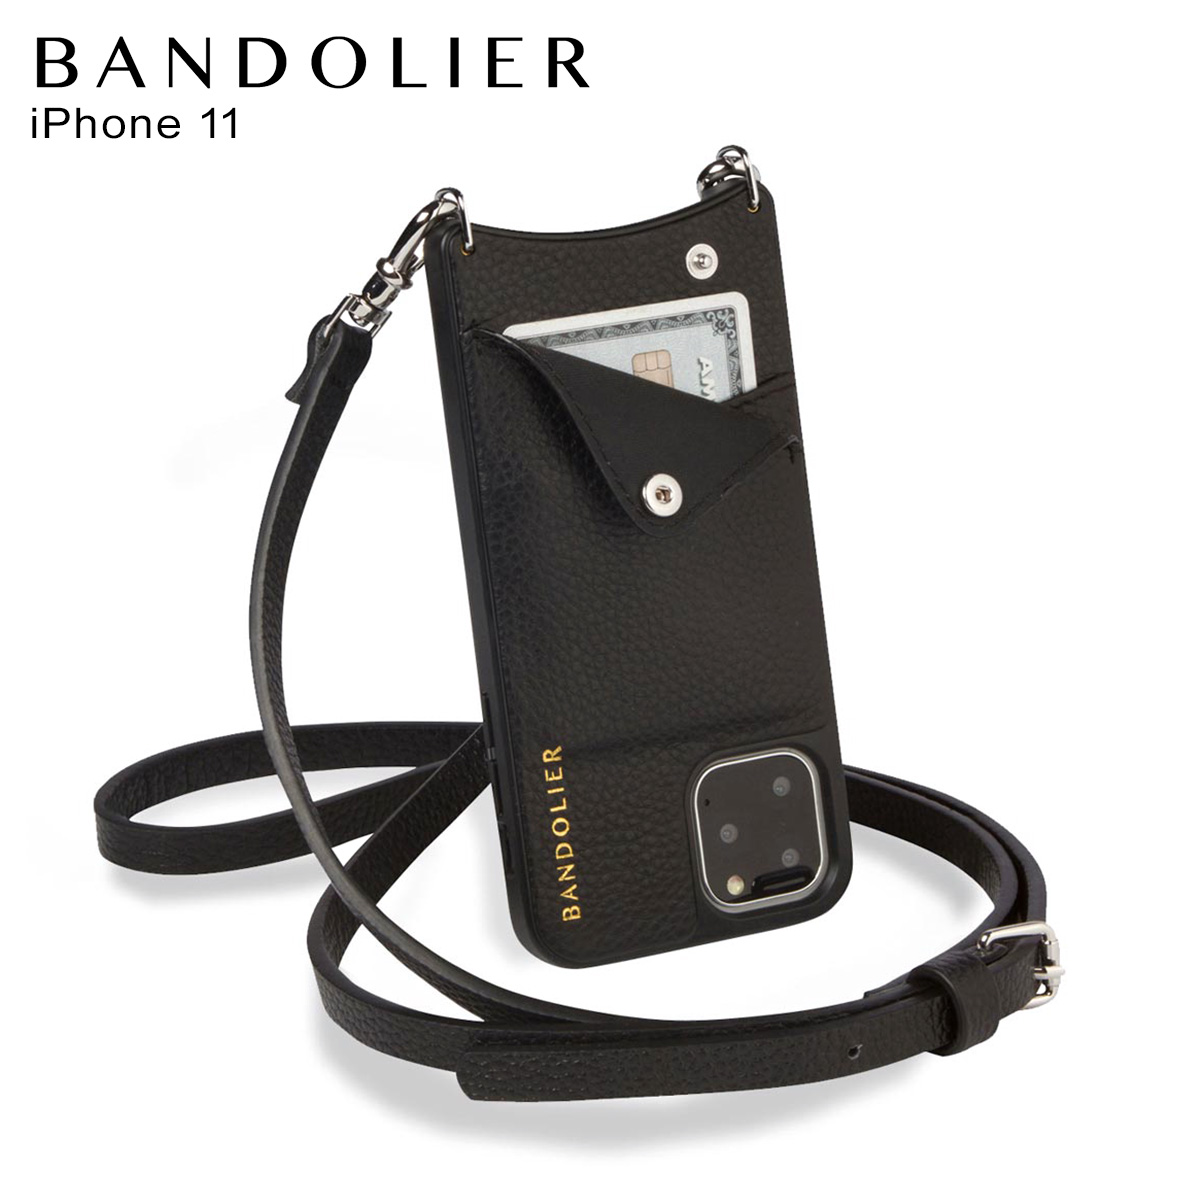 BANDOLIER EMMA SILVER バンドリヤー エマ シルバー iPhone11 ケース スマホ 携帯 ショルダー アイフォン メンズ レディース ブラック 黒 2910